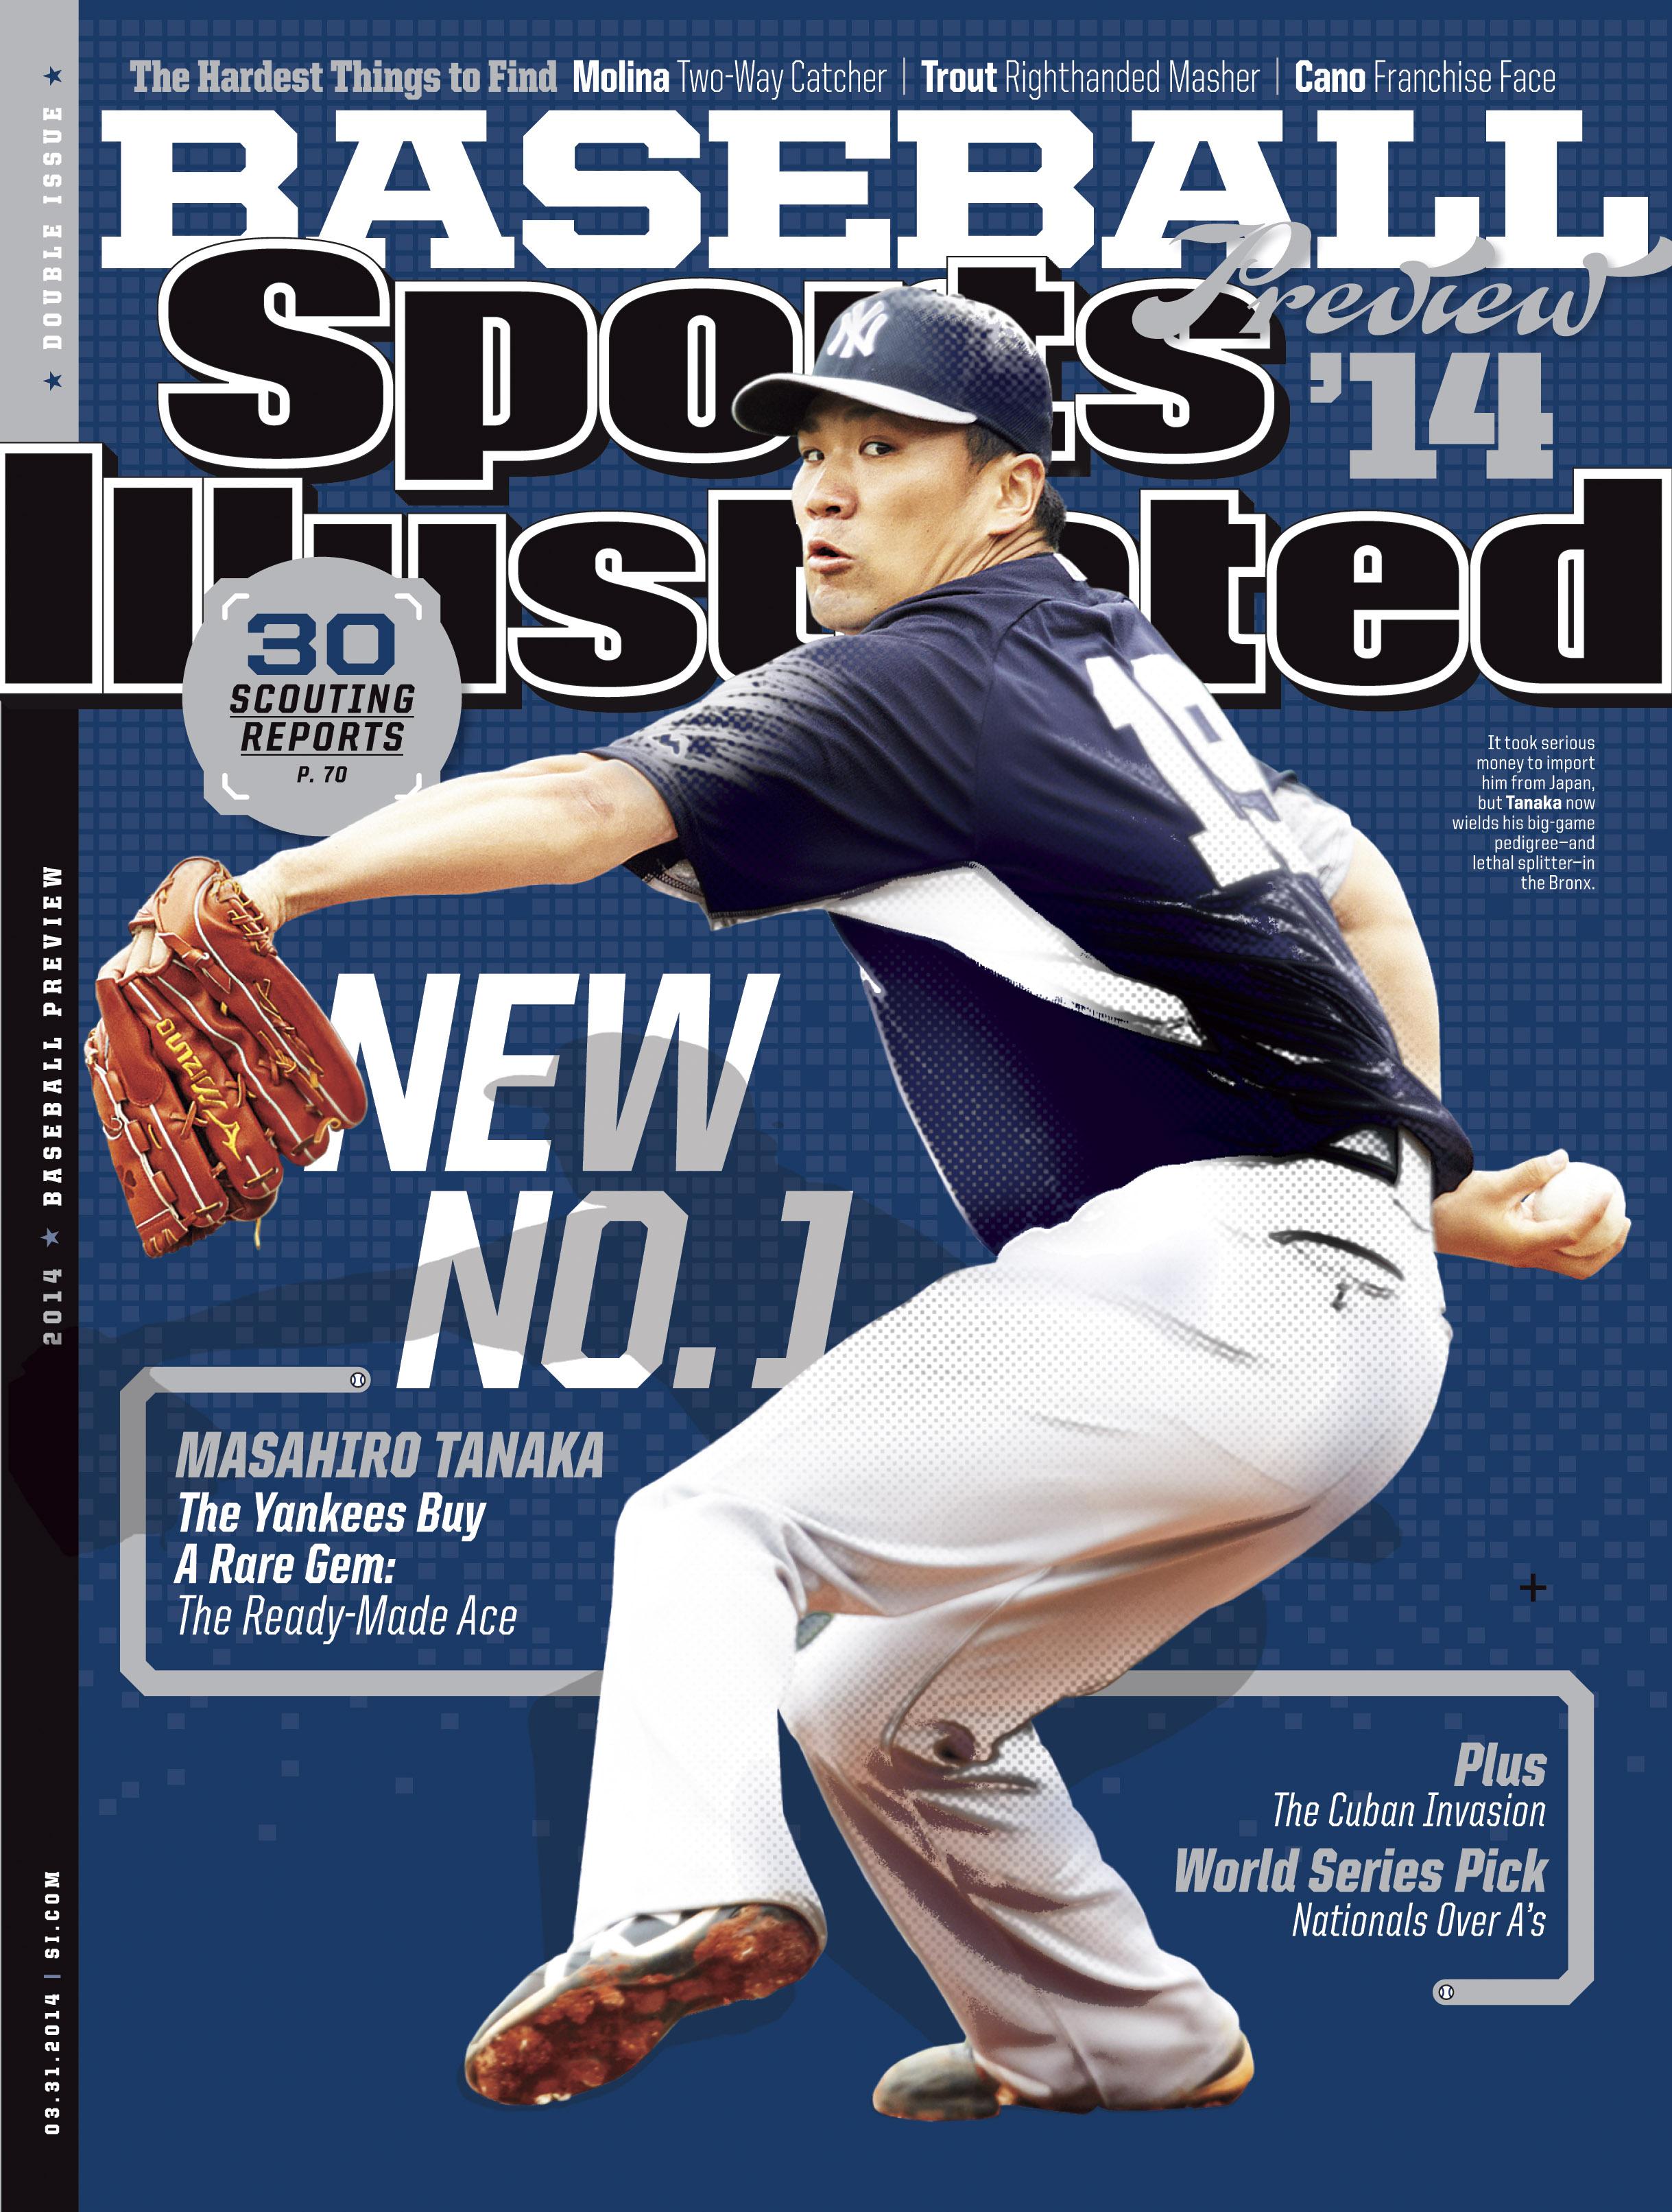 illustrated sports covers si baseball magazine espn sport tanaka mlb yankees inside molina yadier sox softball uconn series visit